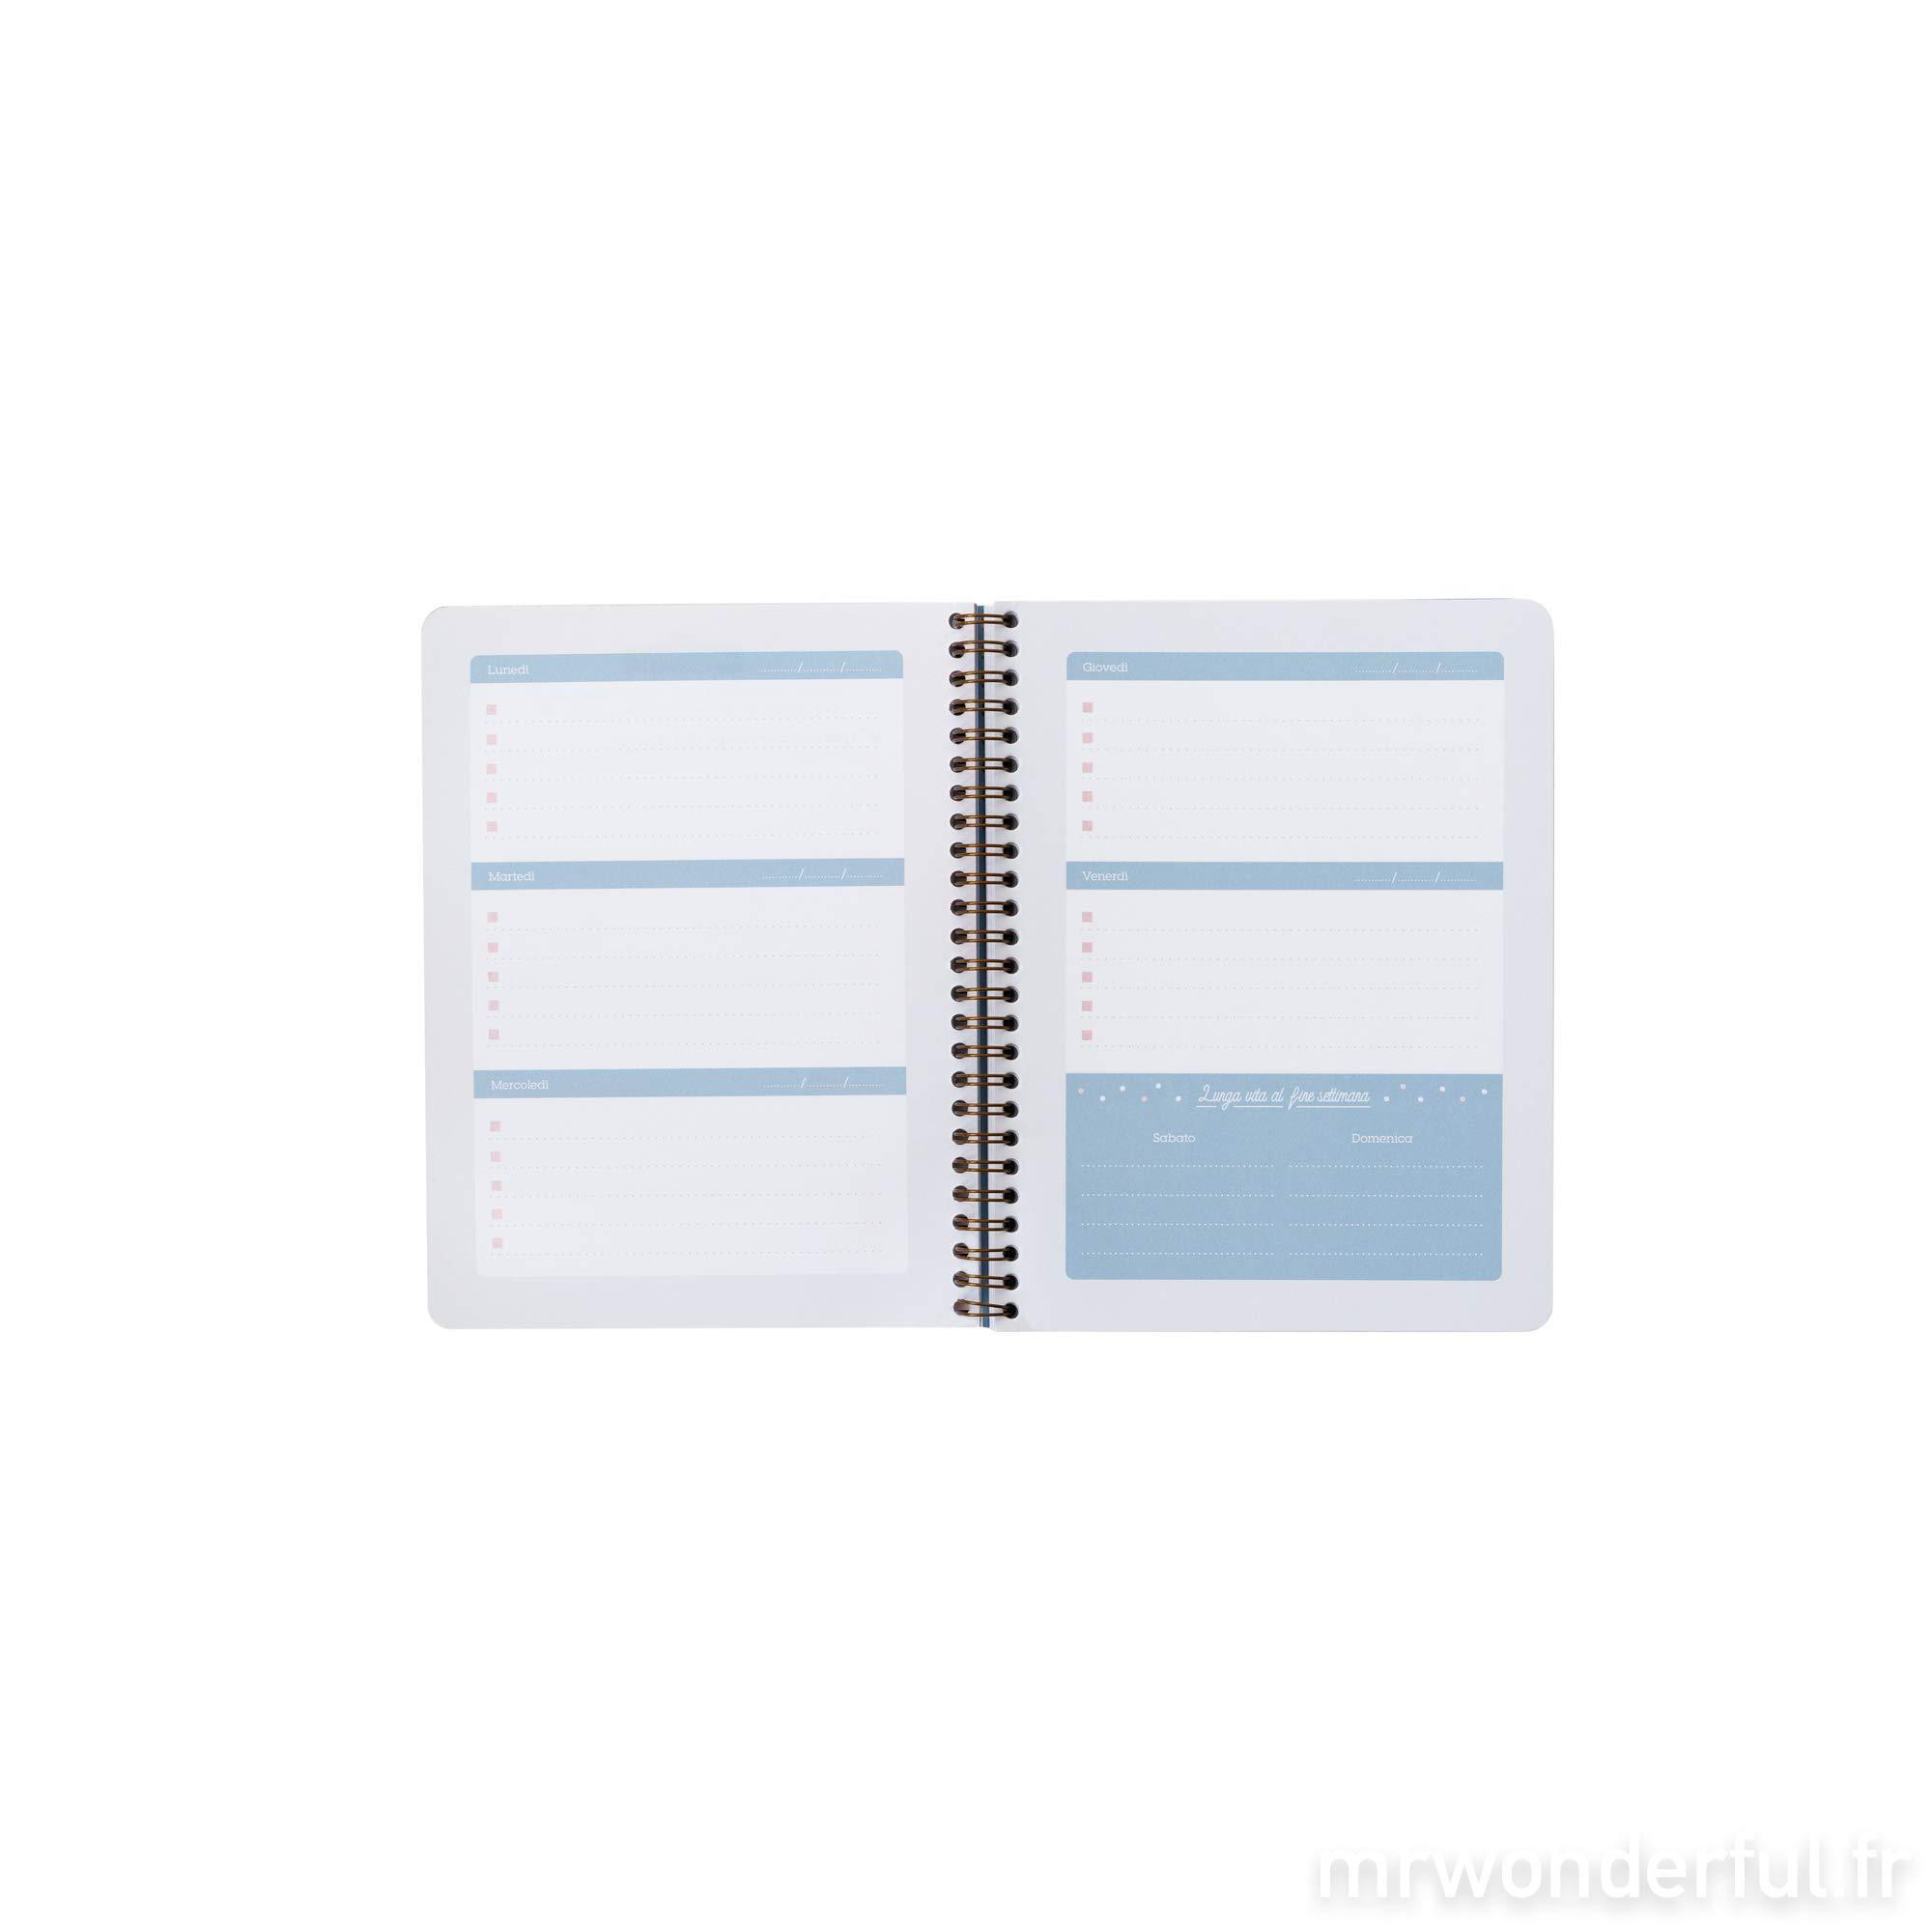 Mr. Wonderful WOA09056IT Weekly Planner Notebook by Mr. Wonderful (Image #3)